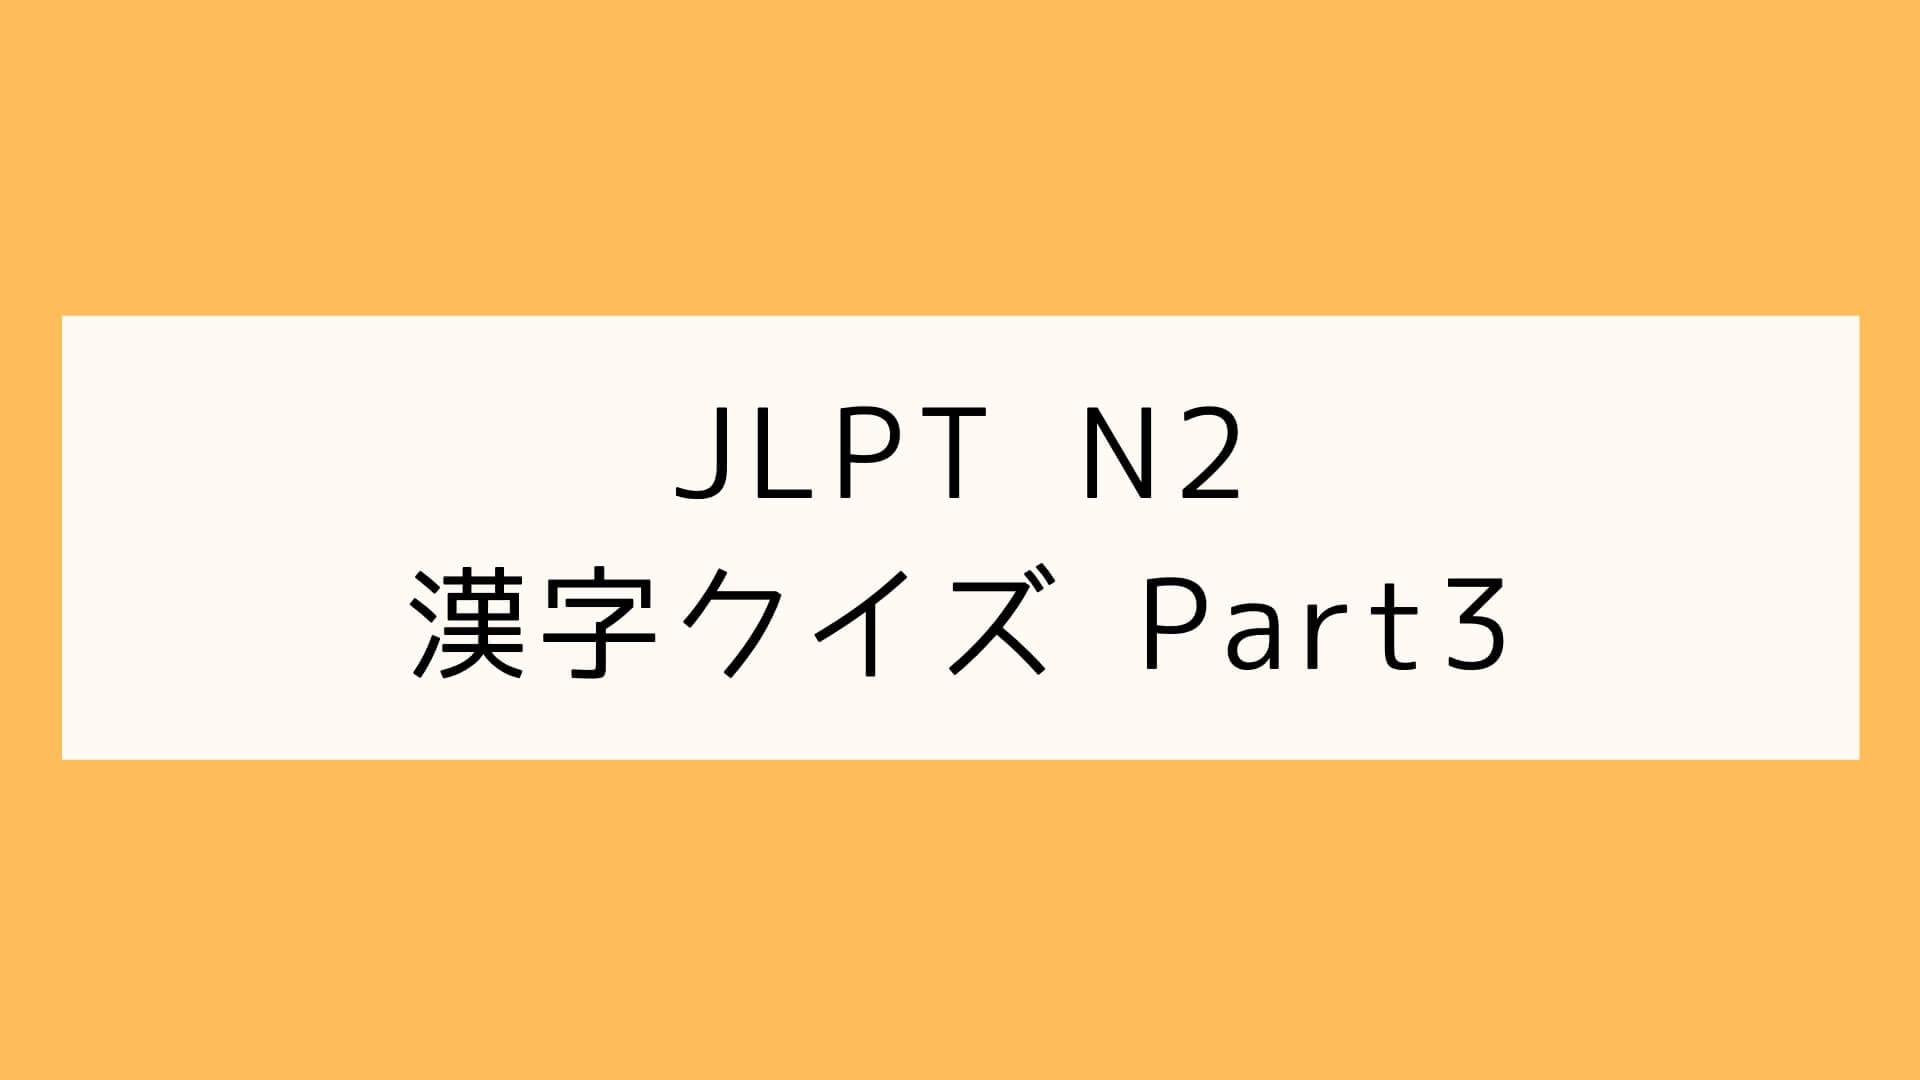 【JLPT N2】漢字クイズ Part3